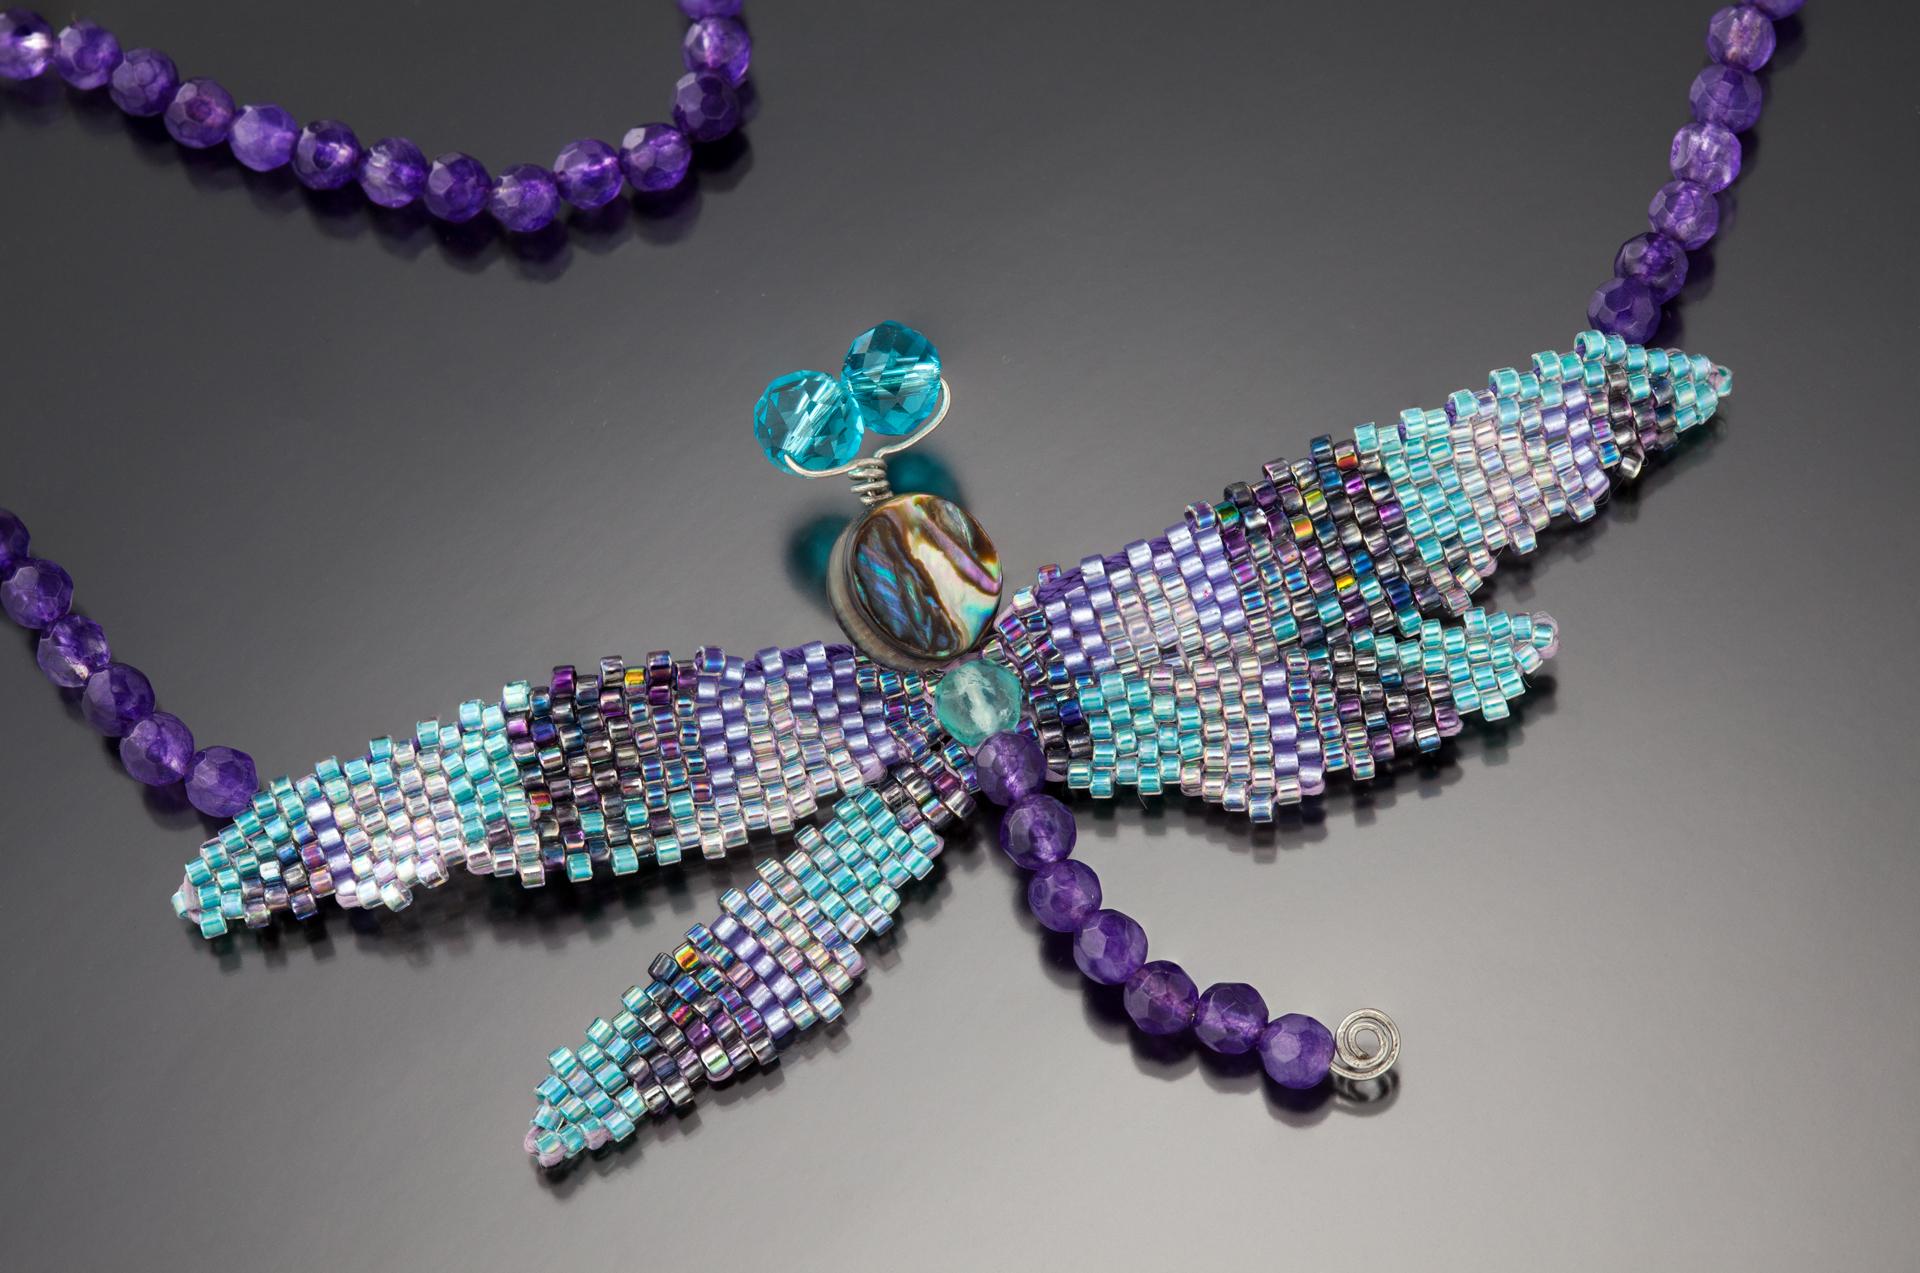 4-karin-alisa-houben-dragonfly-necklace.jpg